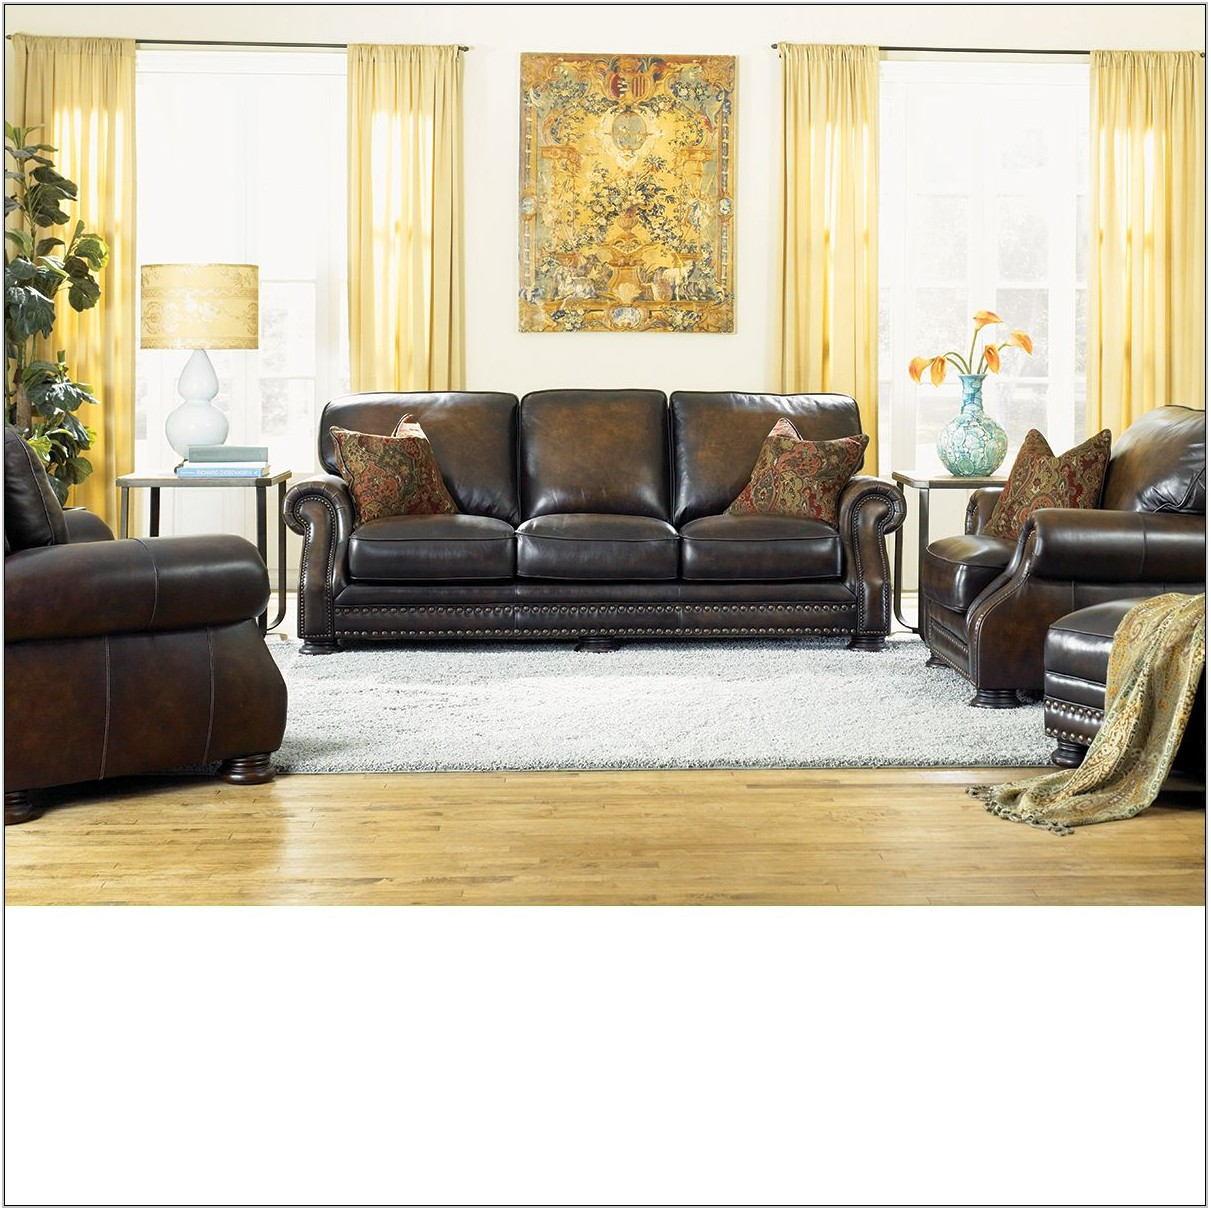 The Dump Living Room Furniture